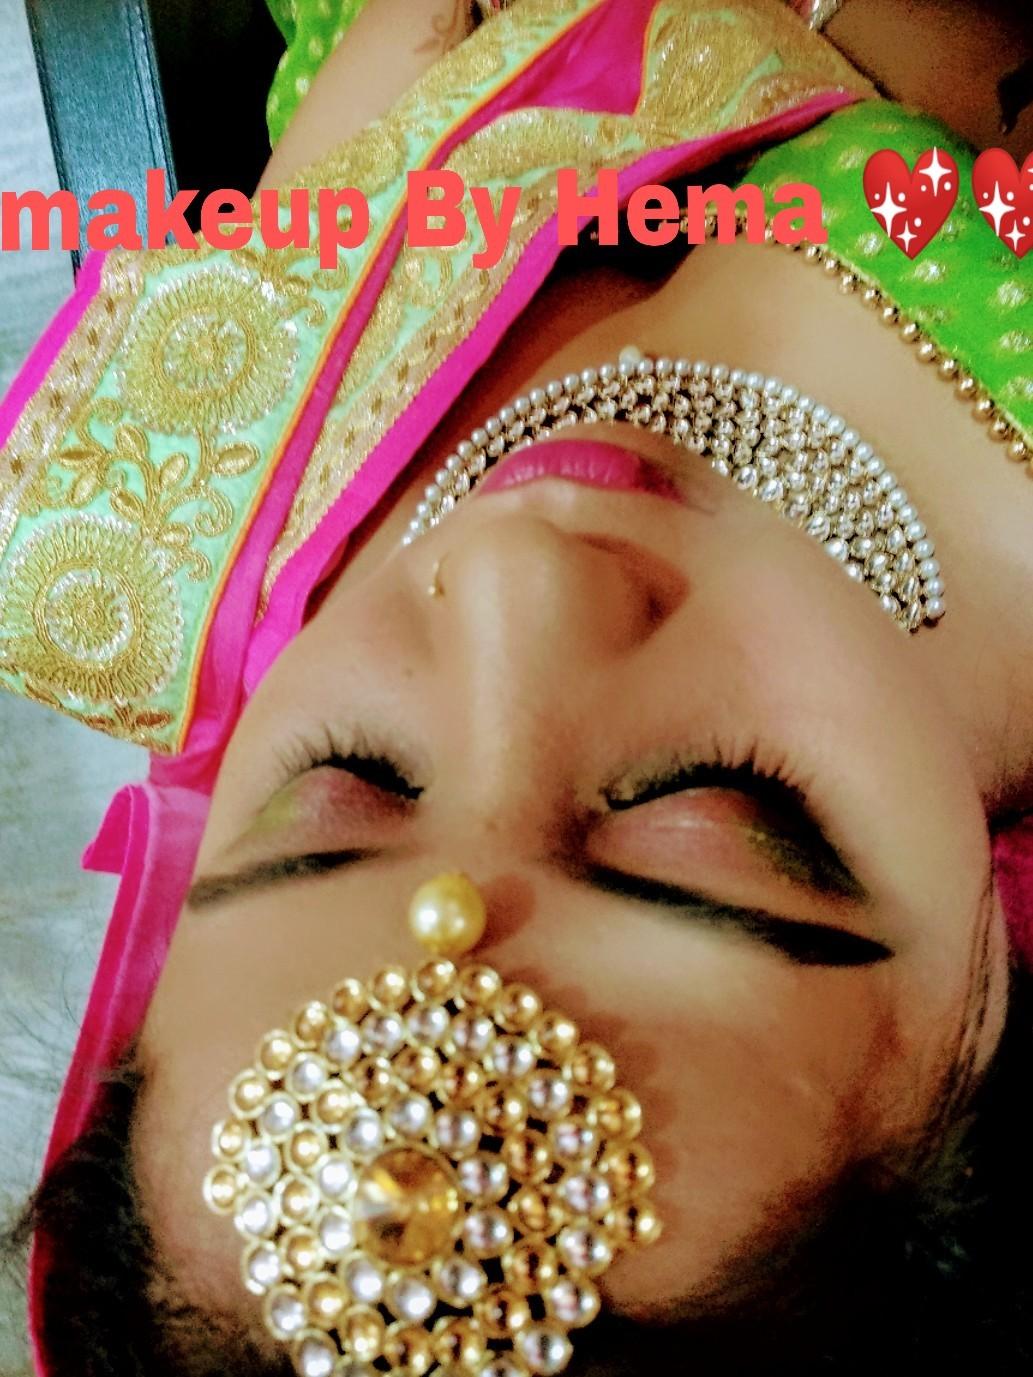 Hema Beauty Clinic Make-up Studio in Sigra, Varanasi-221010